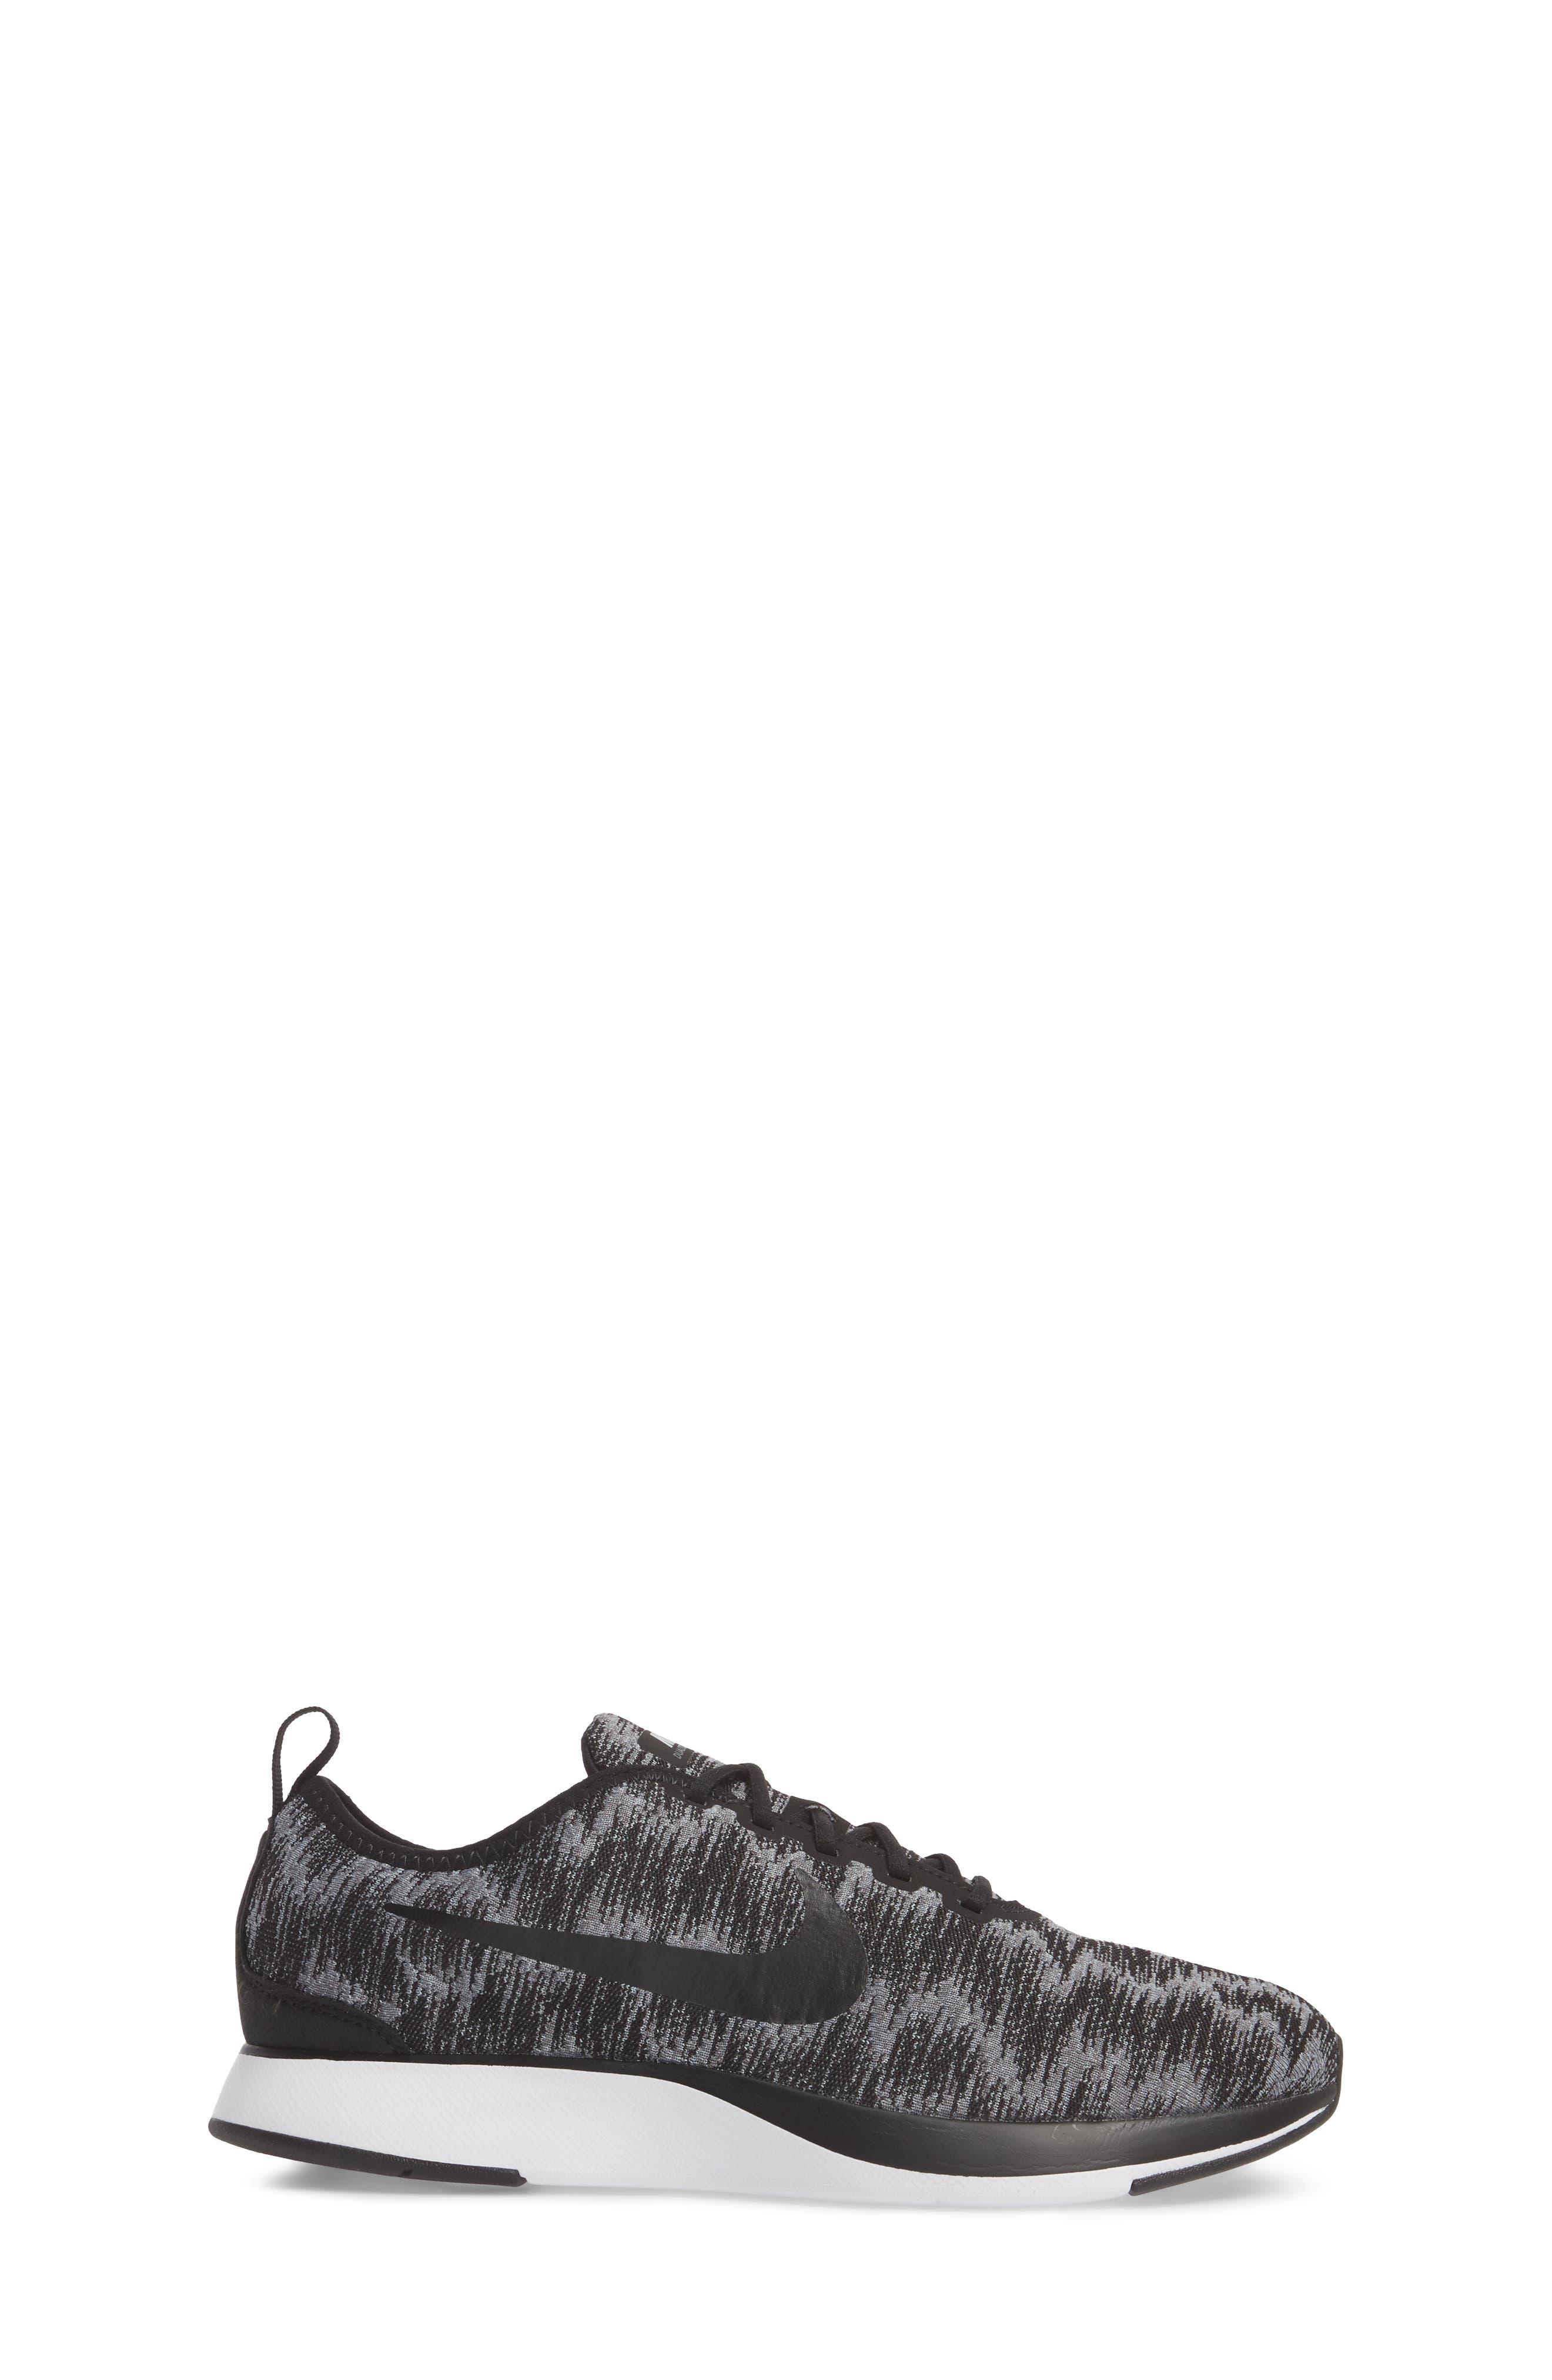 Dualtone Racer SE Sneaker,                             Alternate thumbnail 3, color,                             004